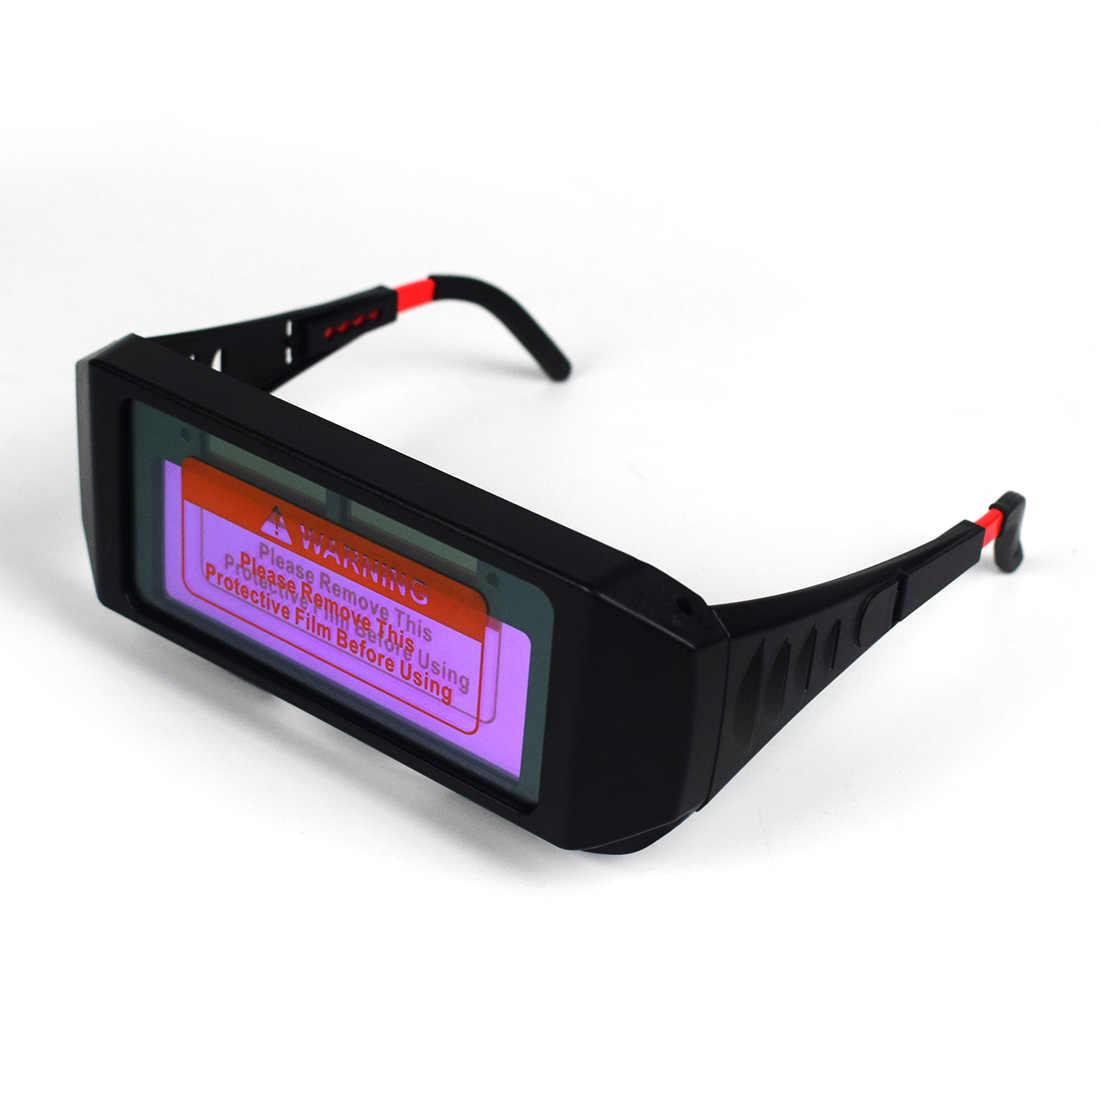 1b1523ae 1 Pair Solar Auto Darkening Welding Goggle, Safety Protective Welding  Glasses Mask Helmet, Eyes